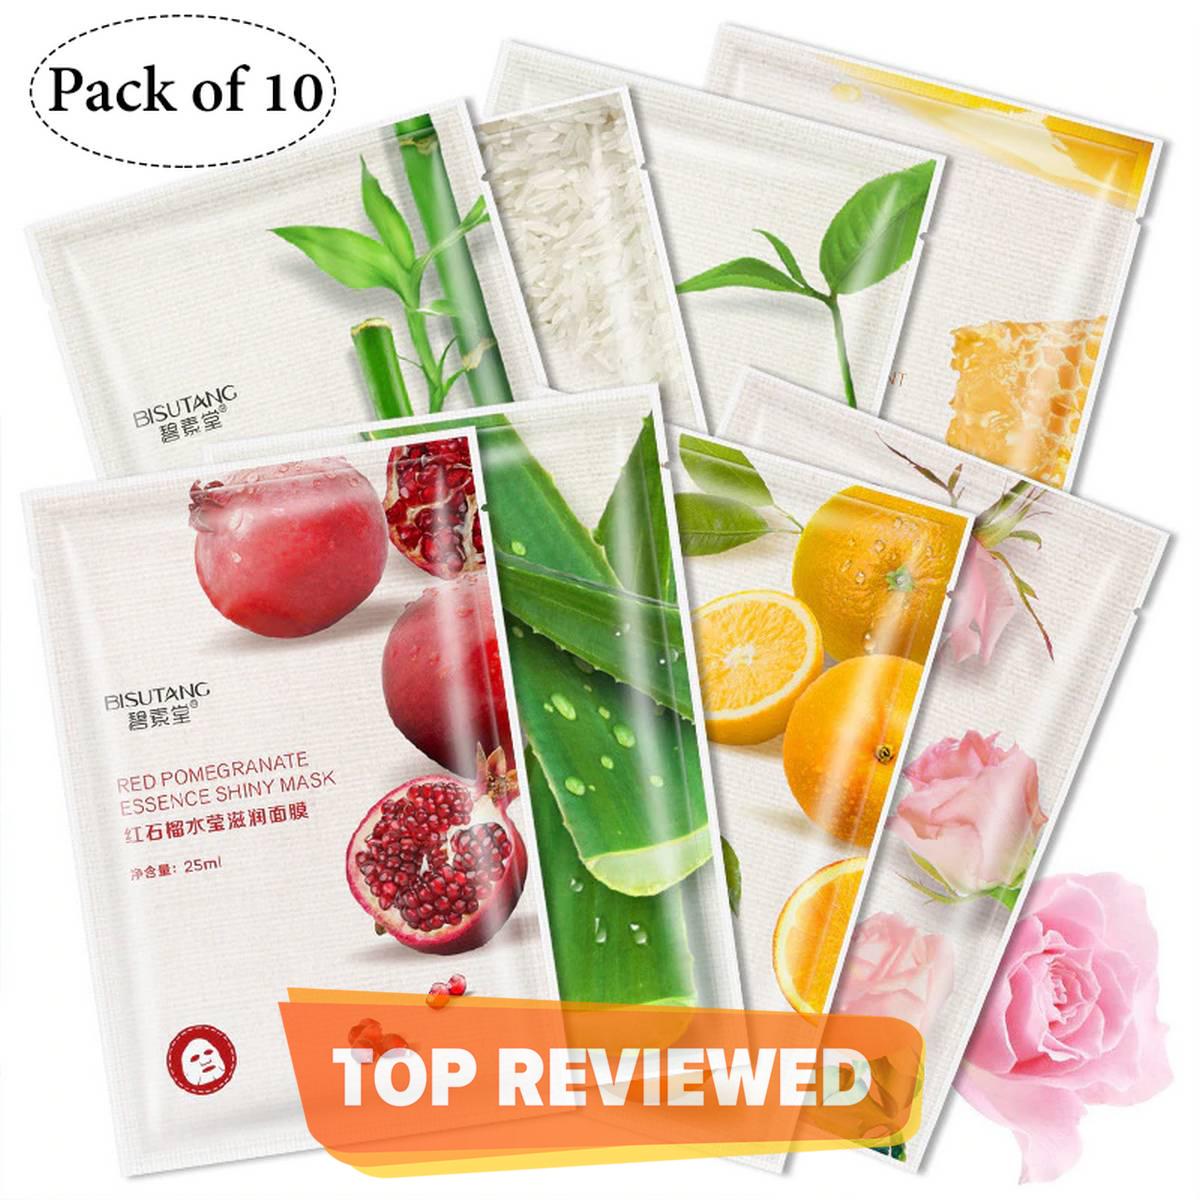 Bisutang Pack of 10 Sheet Mask Fruit Moisturizing Facial Mask